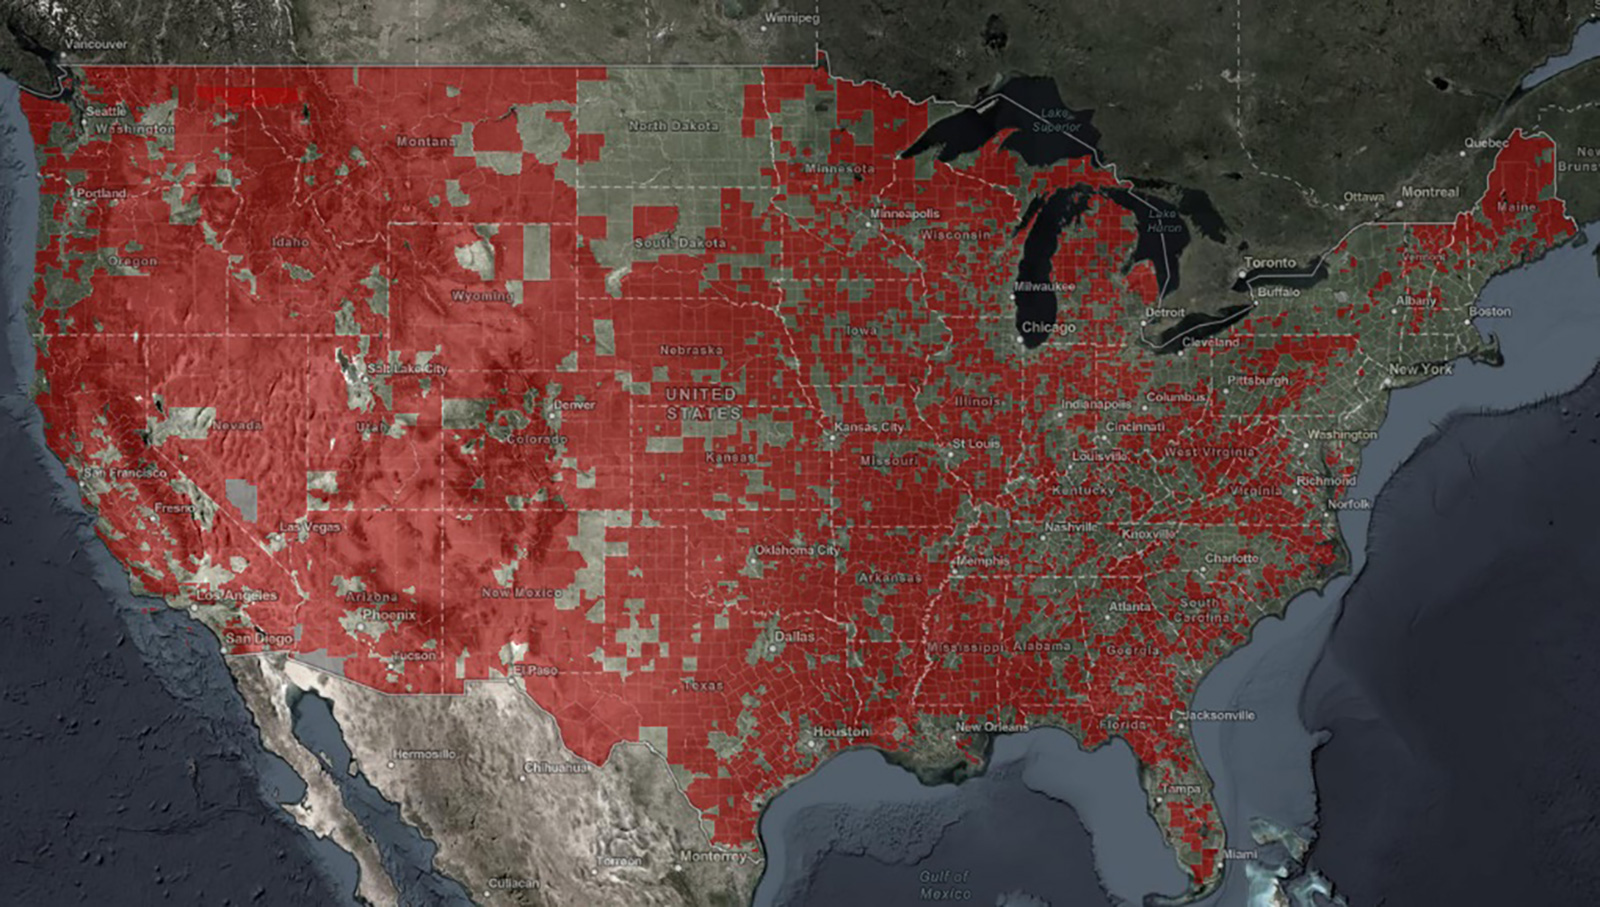 NTIA's interactive broadband map highlights the digital divide